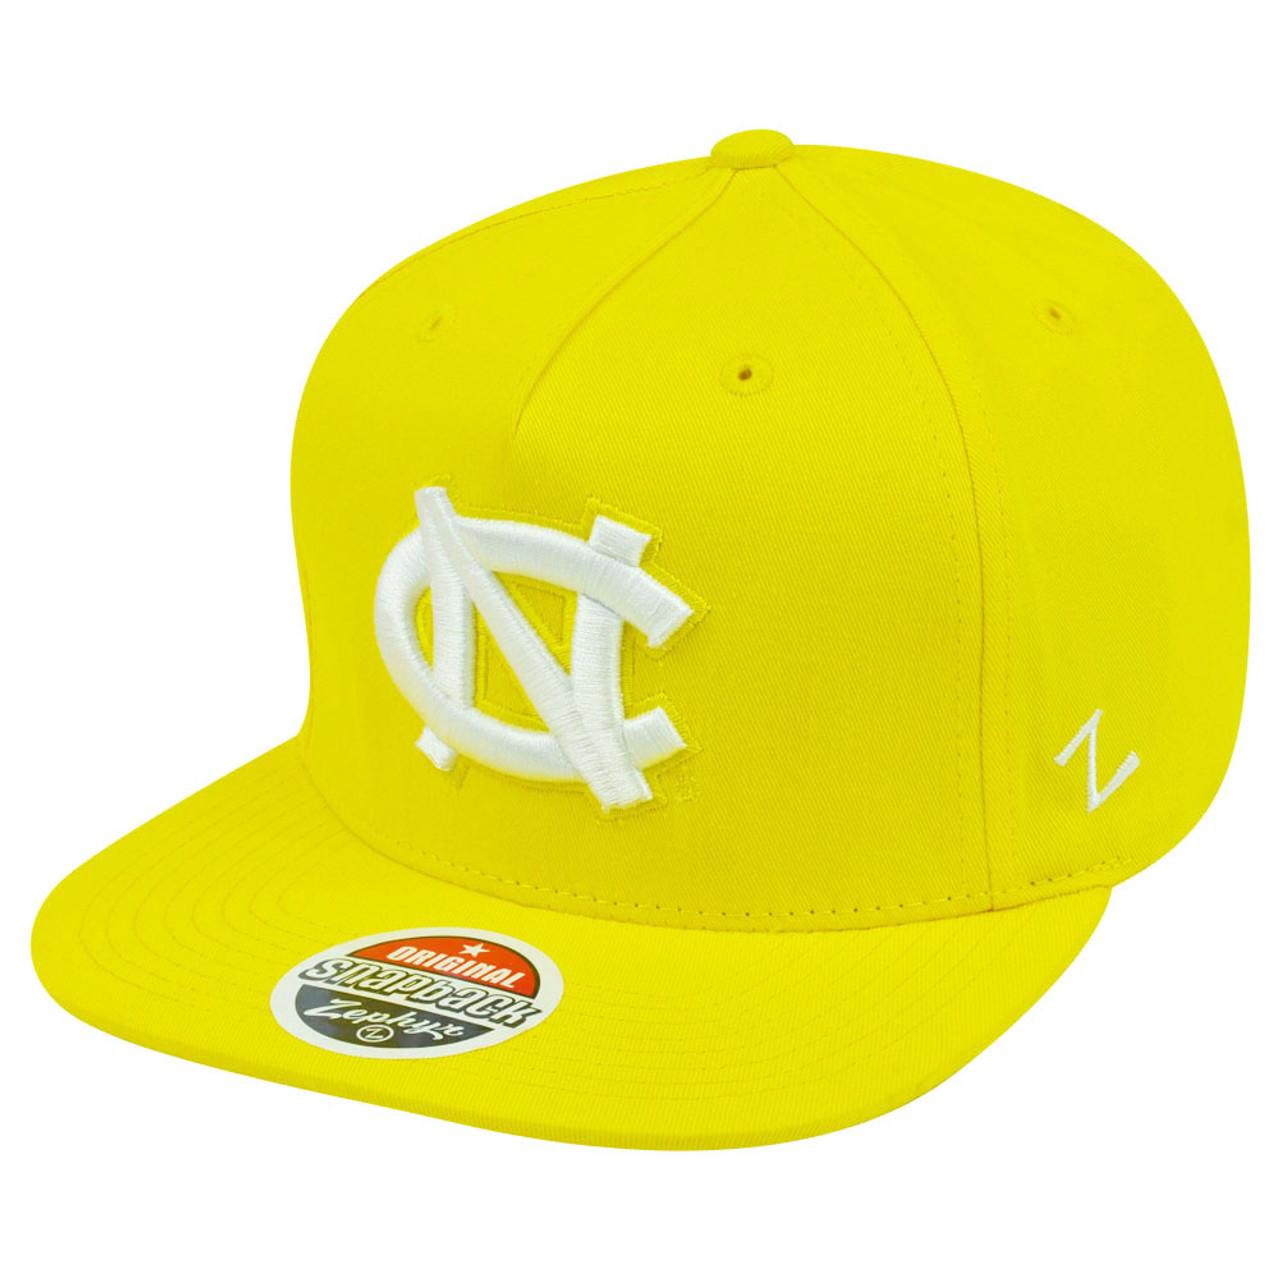 ca399eb39a NCAA North Carolina Tar Heels Yellow Snapback Flat Bill Zephyr Popsicle Hat  Cap